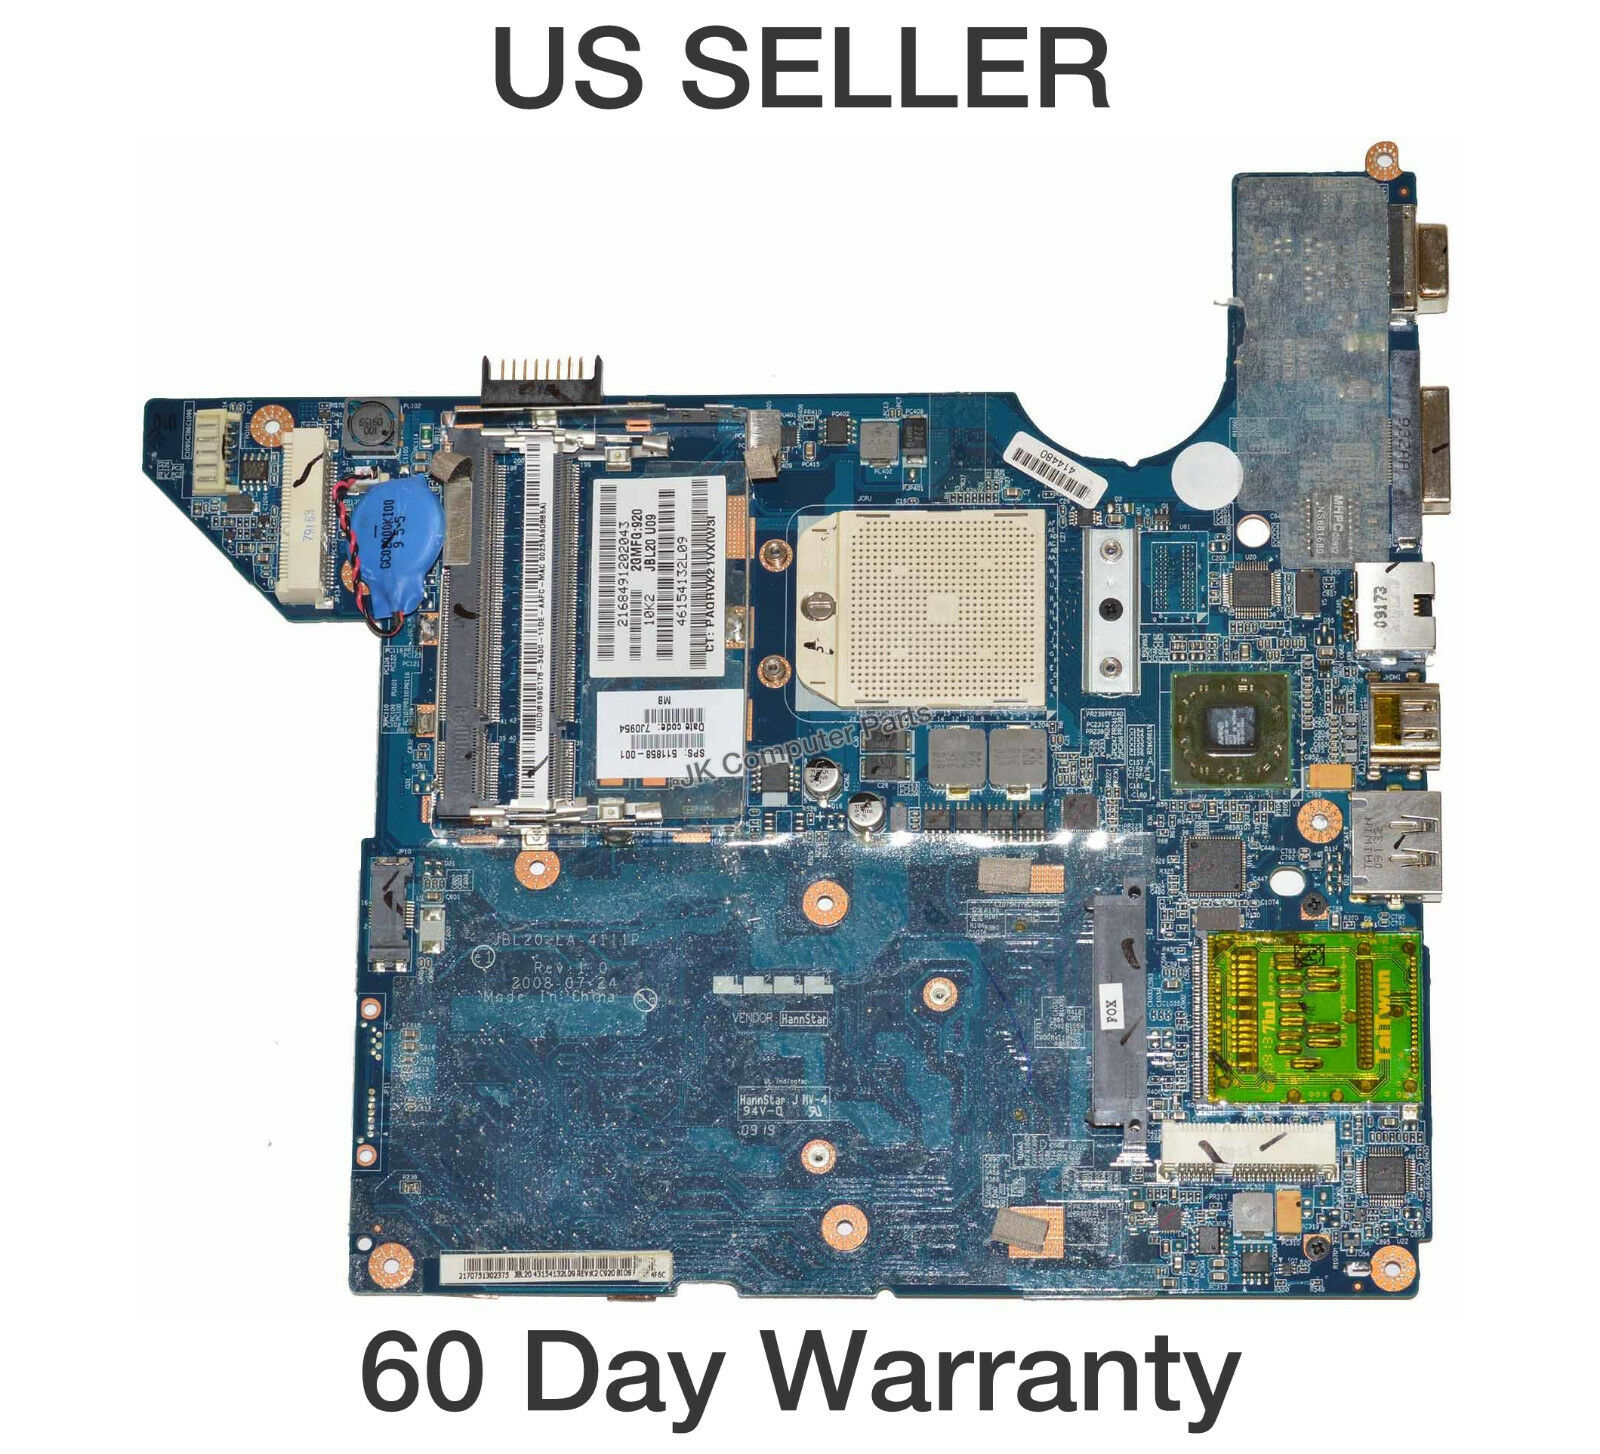 sps 640893-001 HP G6 G6-1000 AMD Motherboard,Grade A